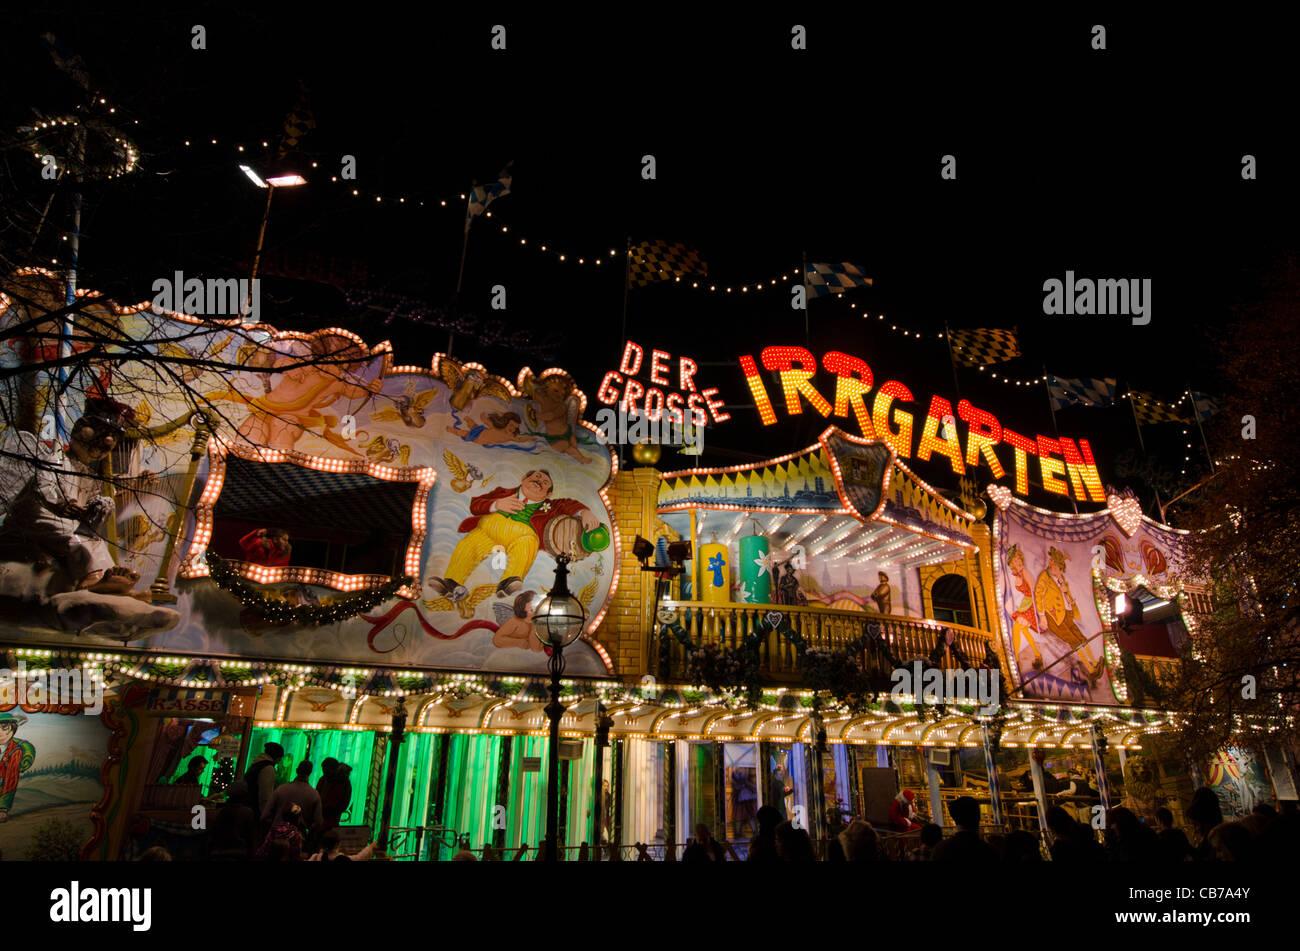 Der Grosse Irrgarten stall Hyde Park Winter Wonderland lights. 2011 - Stock Image